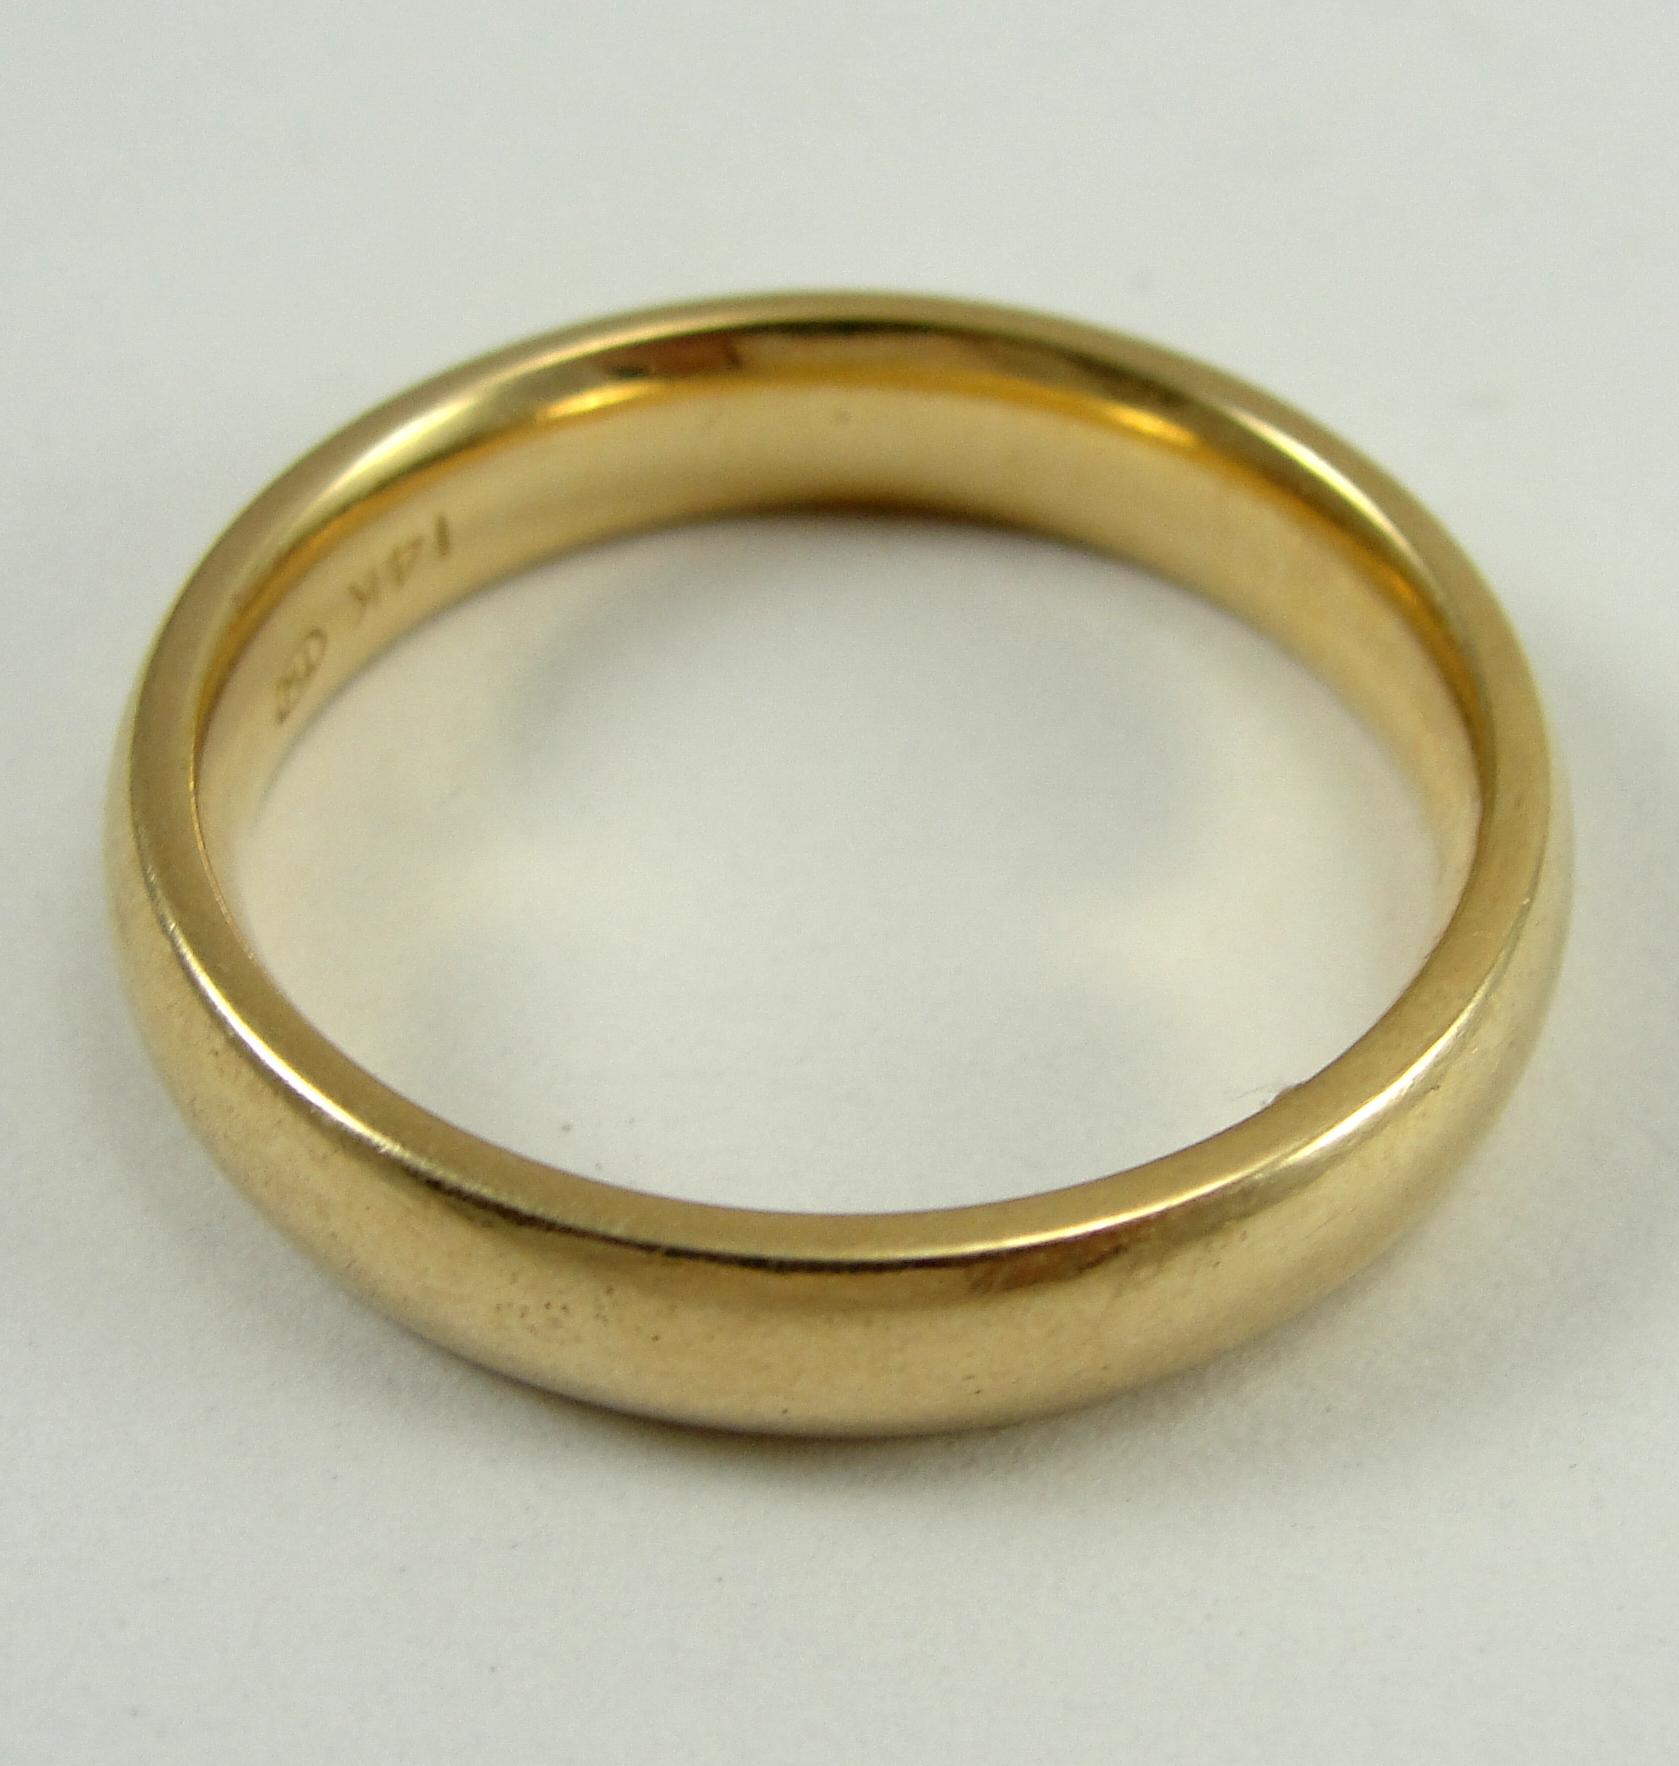 1315588494 14K-Yellow-Gold-Ring-Band-Wedding-4.15mm-Width-Sz-7.75 2.jpg